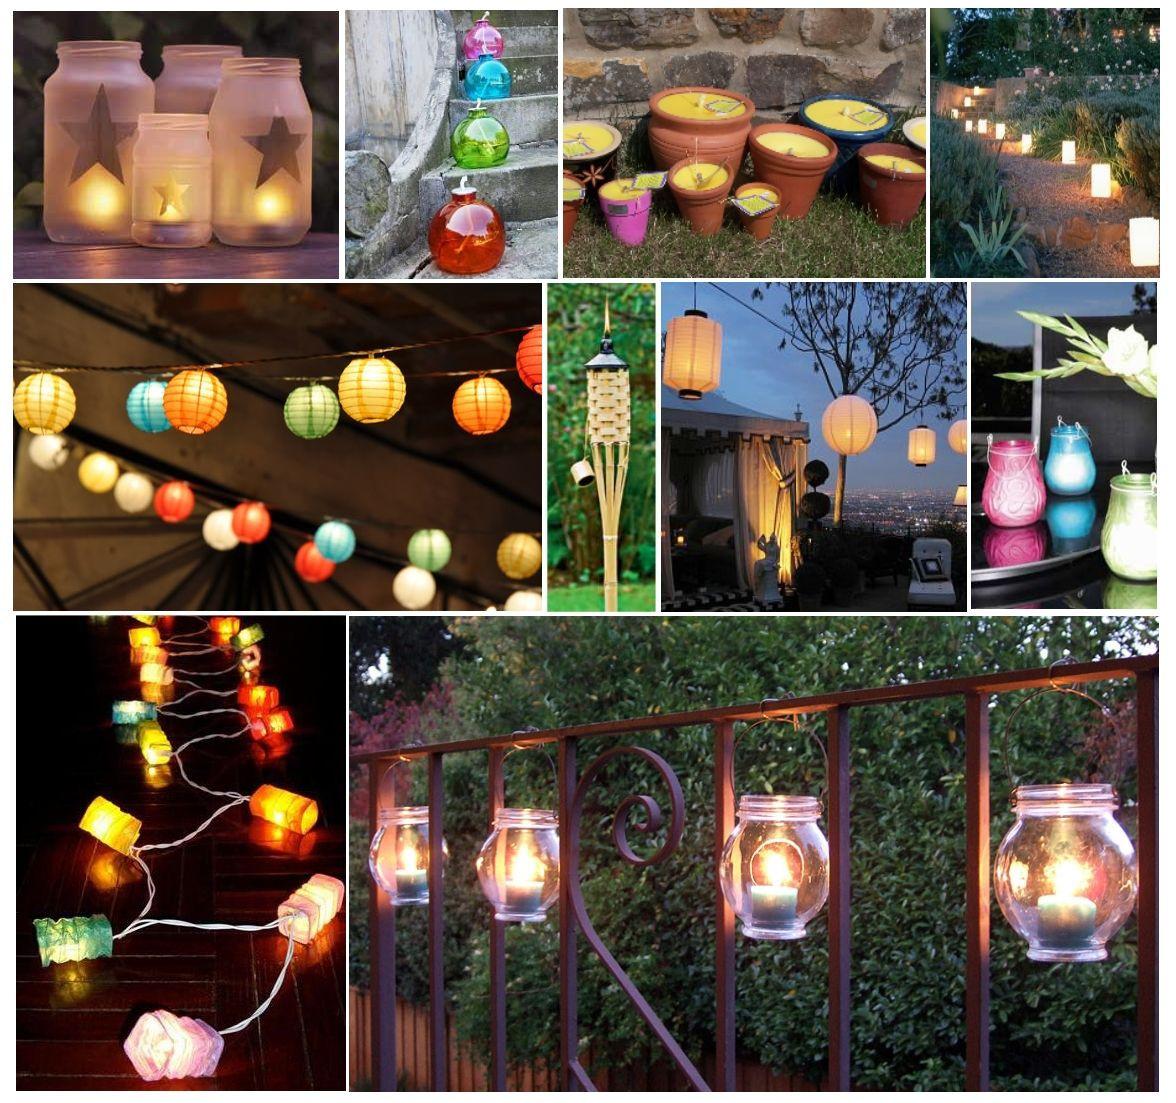 Pinterest Backyard Party Ideas  Backyard BBQ Party Decorating Ideas